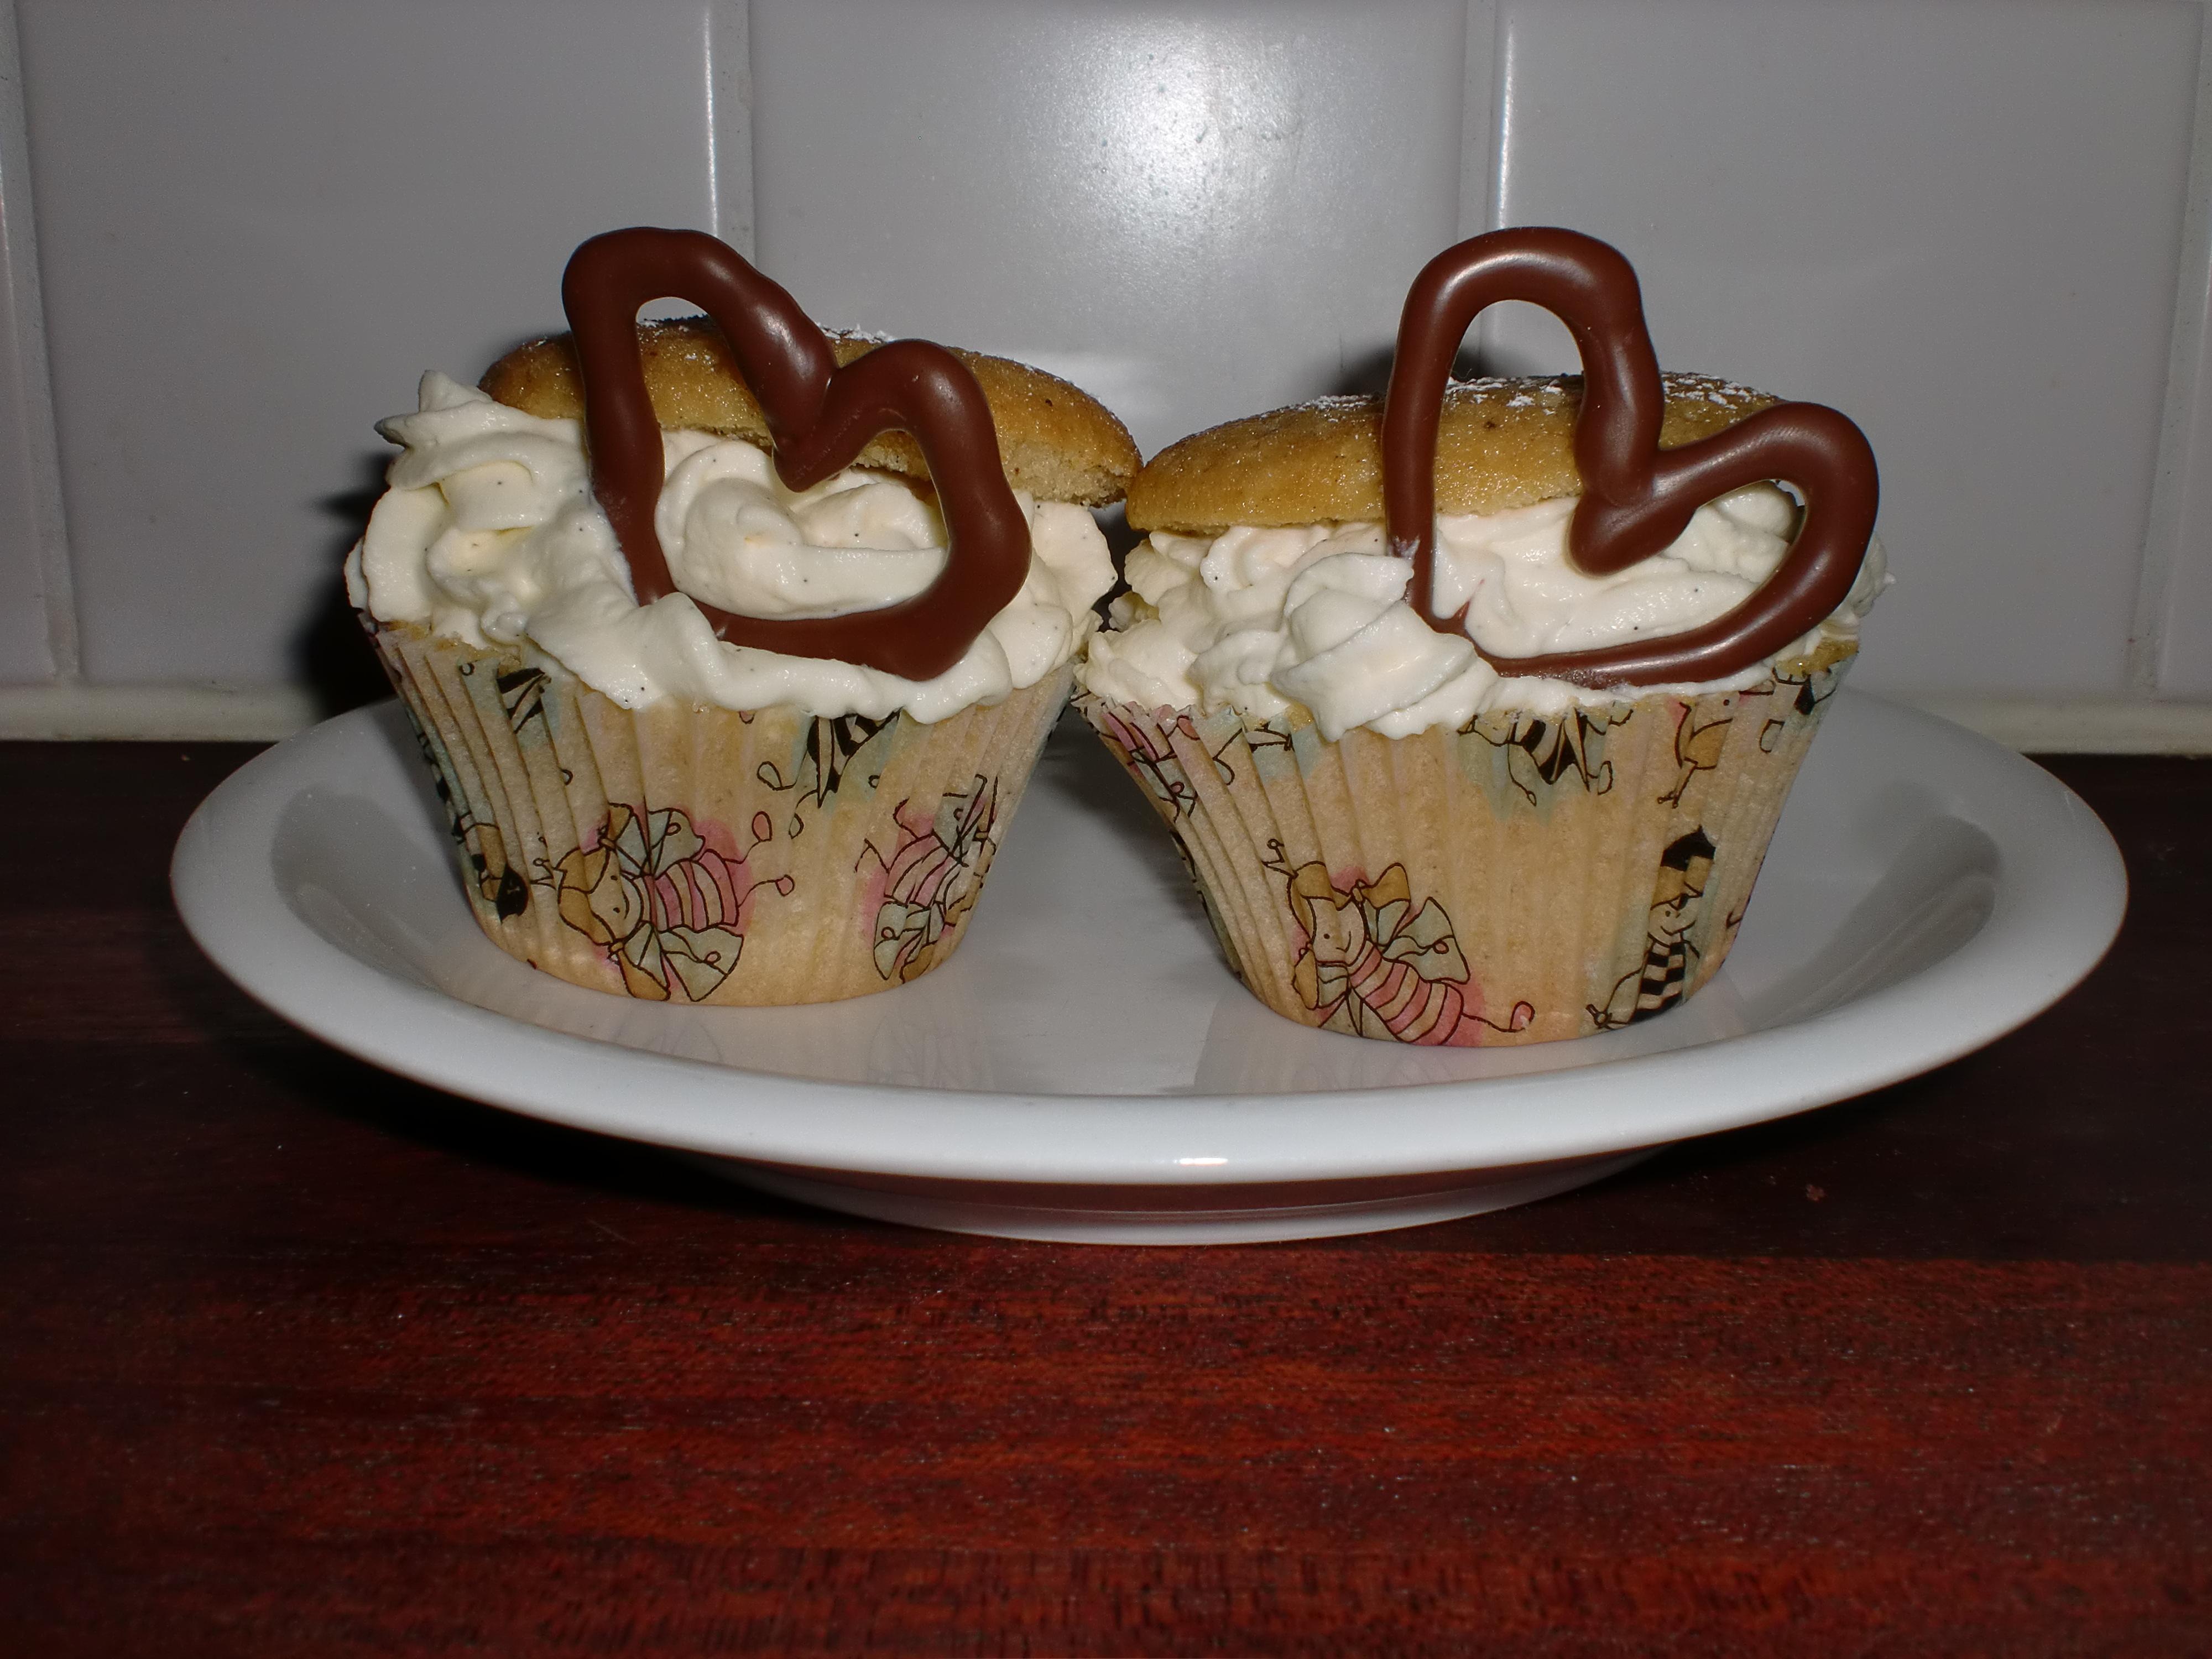 fluffiga muffins